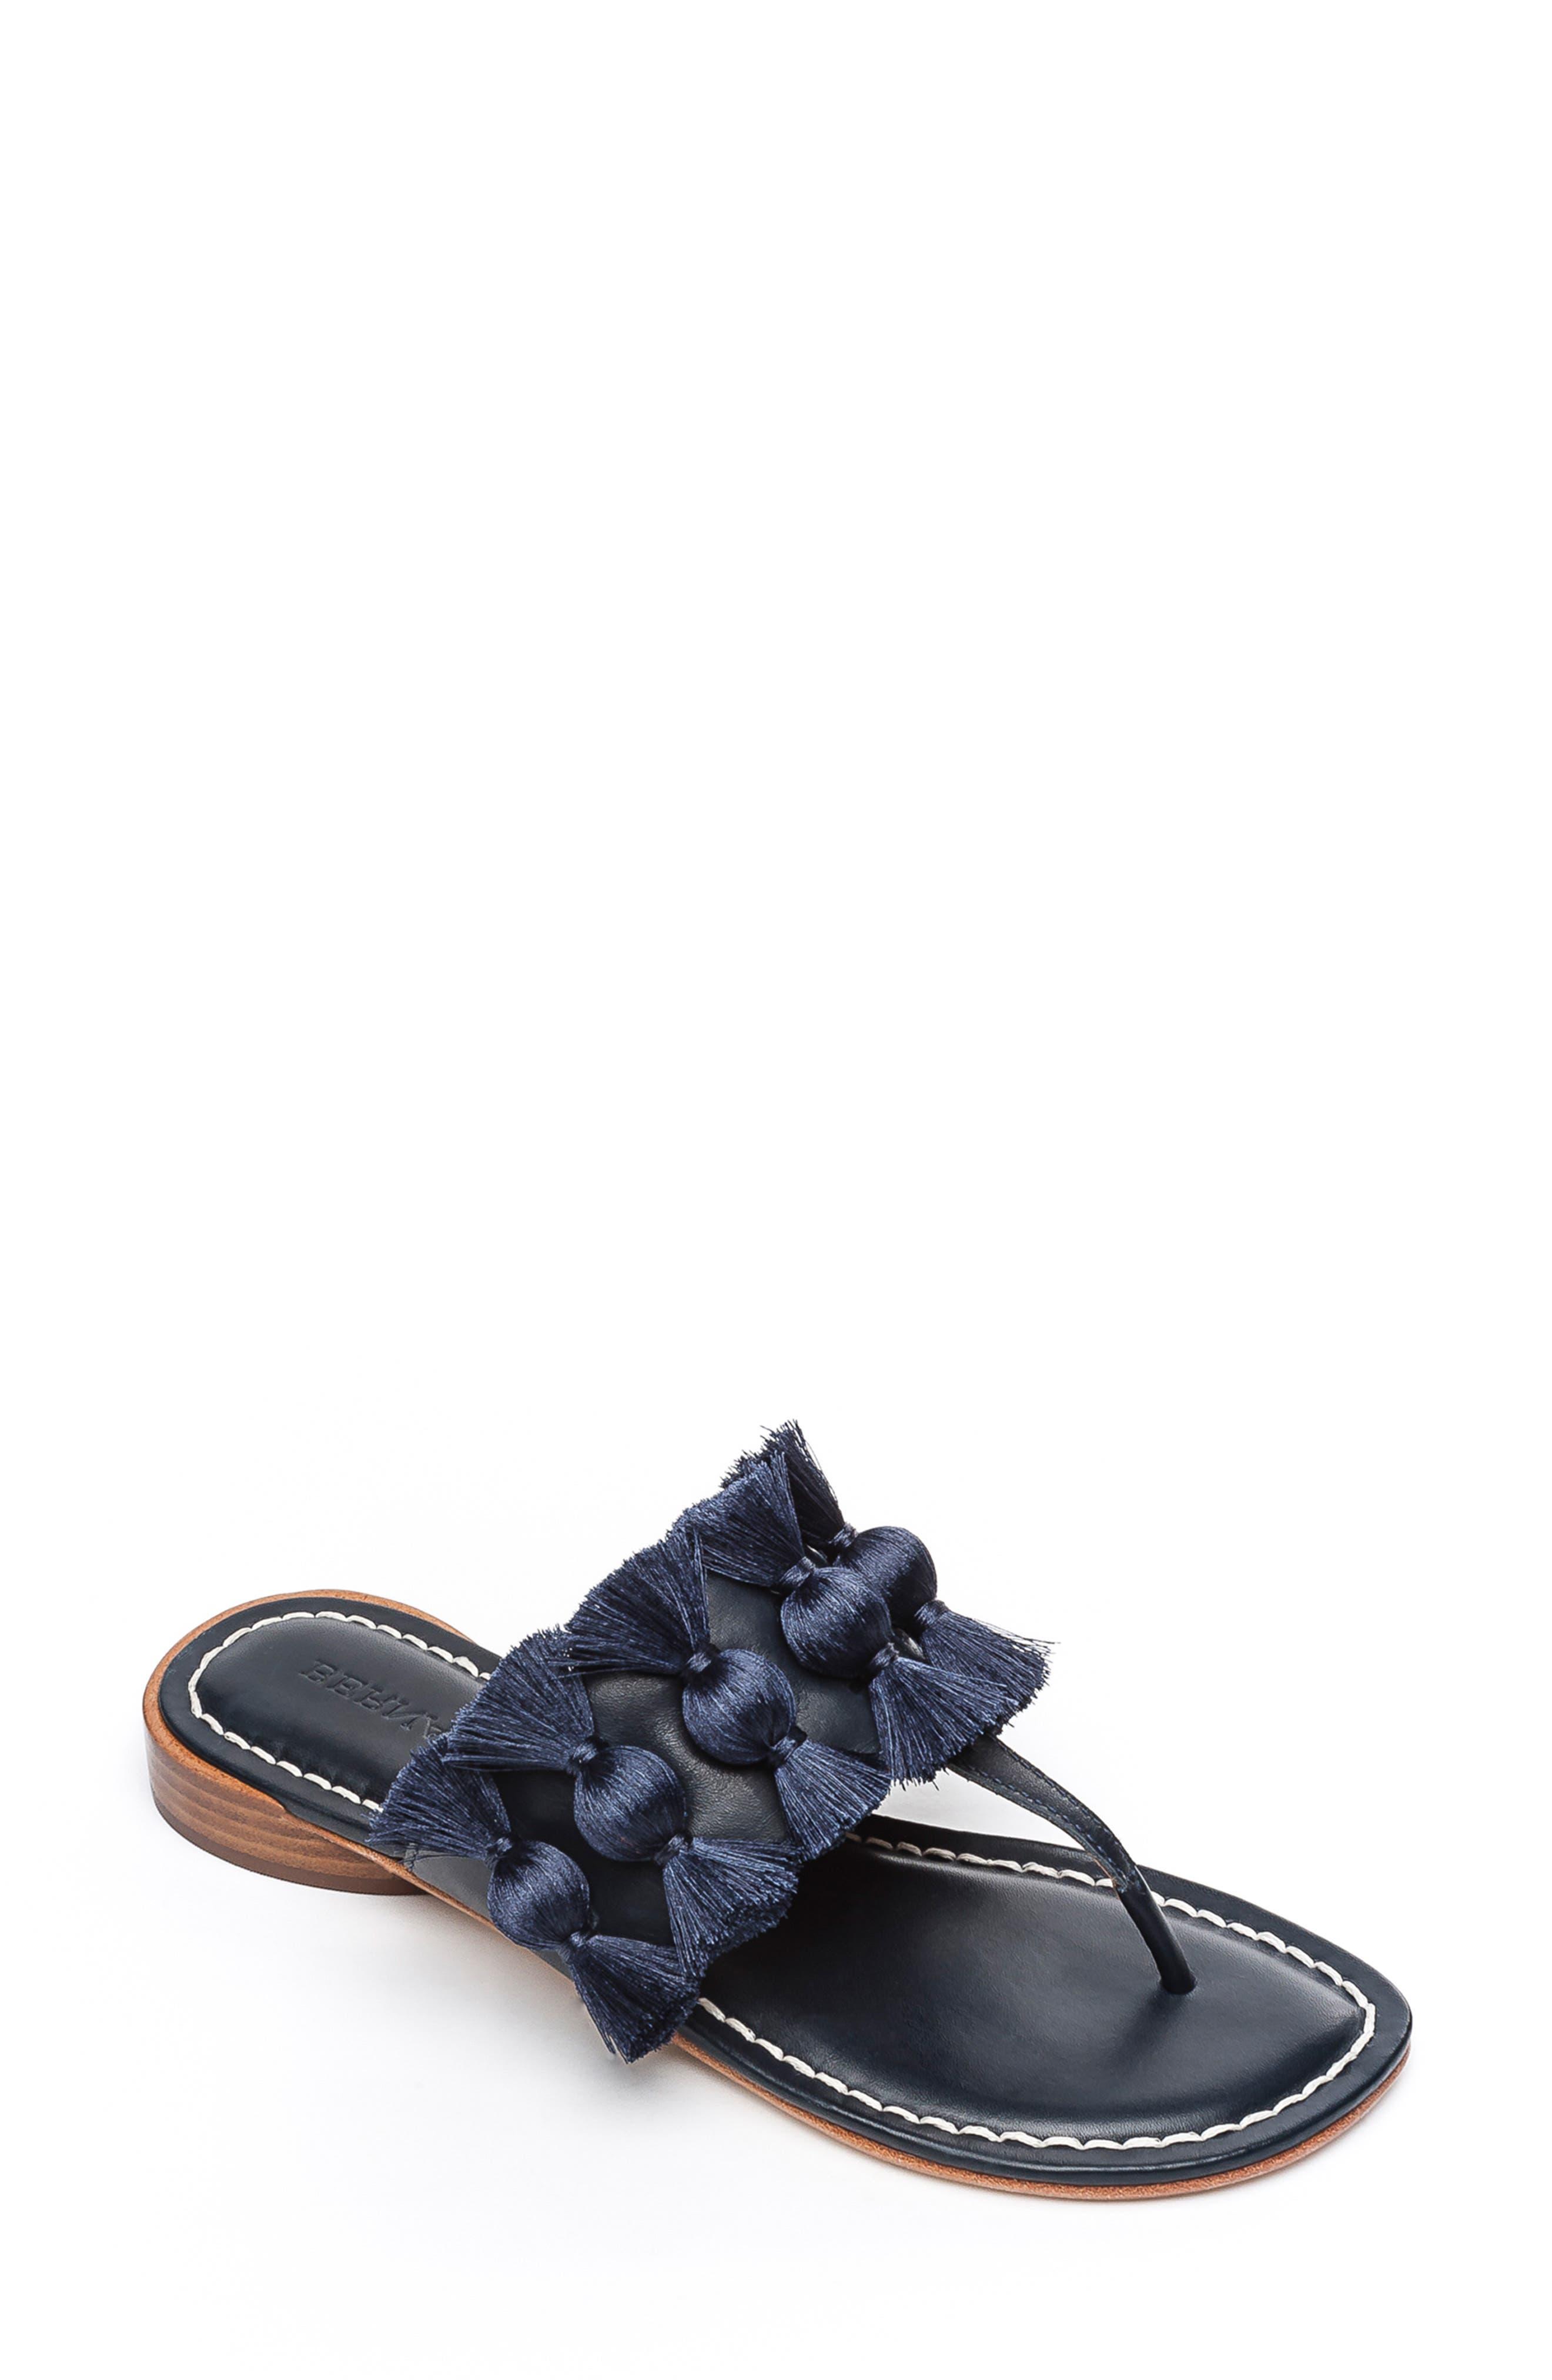 Bernardo Footwear Tara Flip Flop- Blue